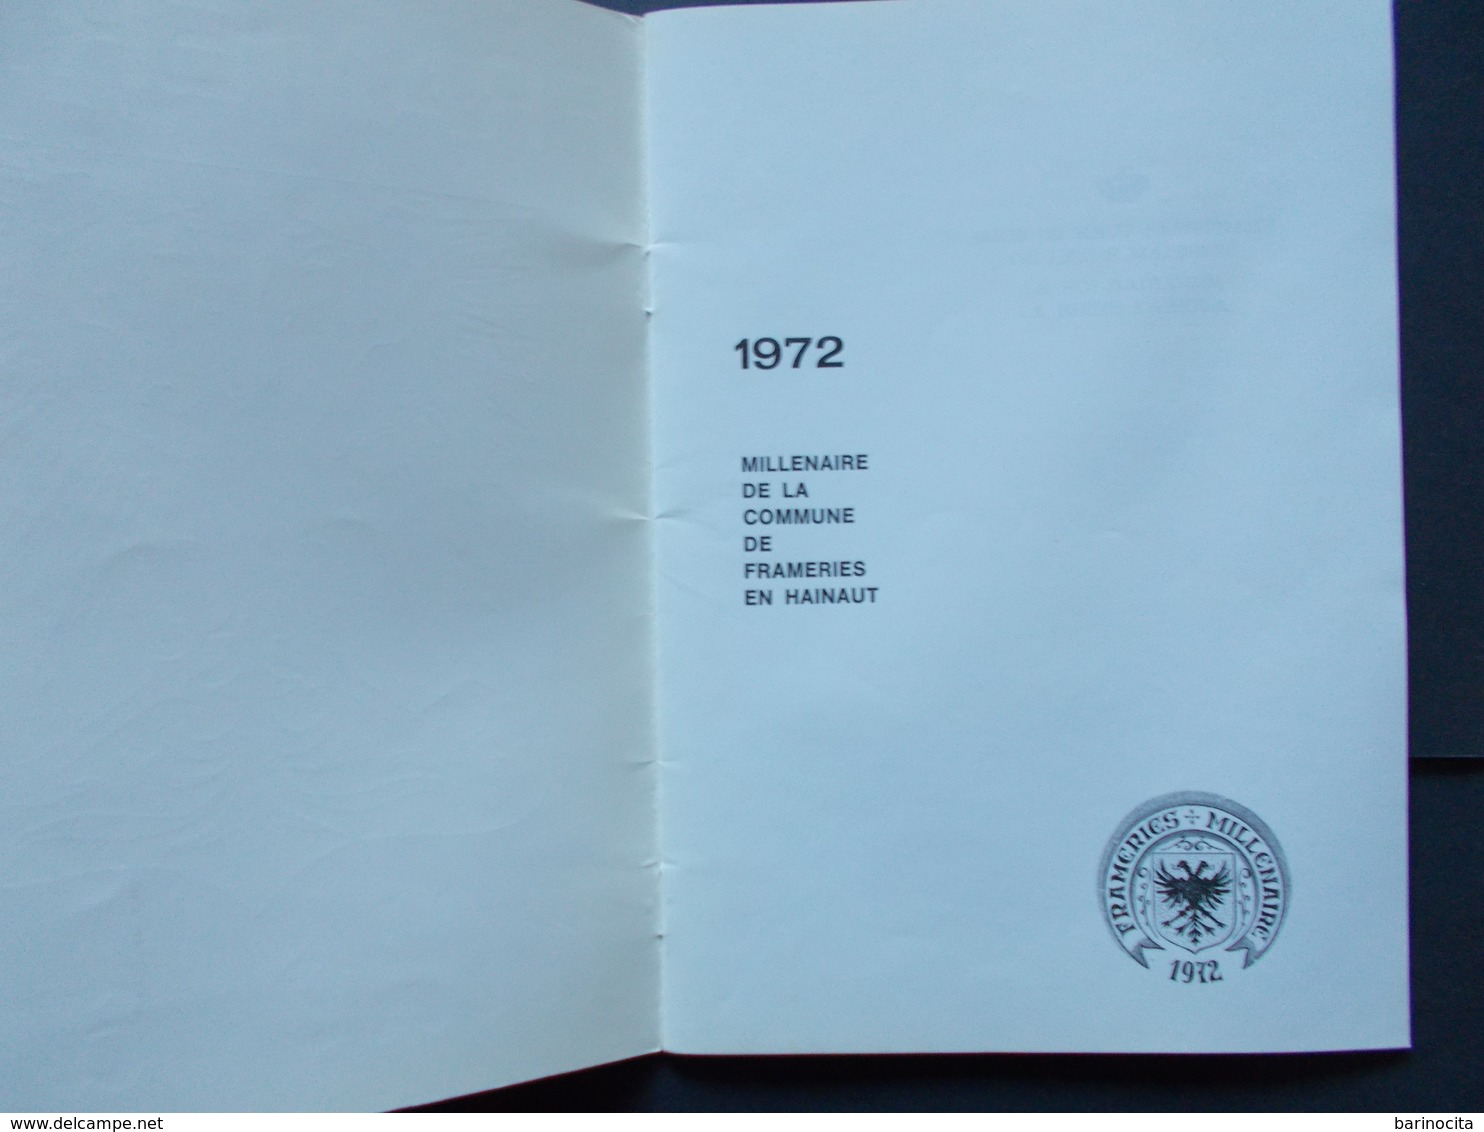 FRAMERIES - MILLE ANS - Frameries 972 /1972 - Cultuur